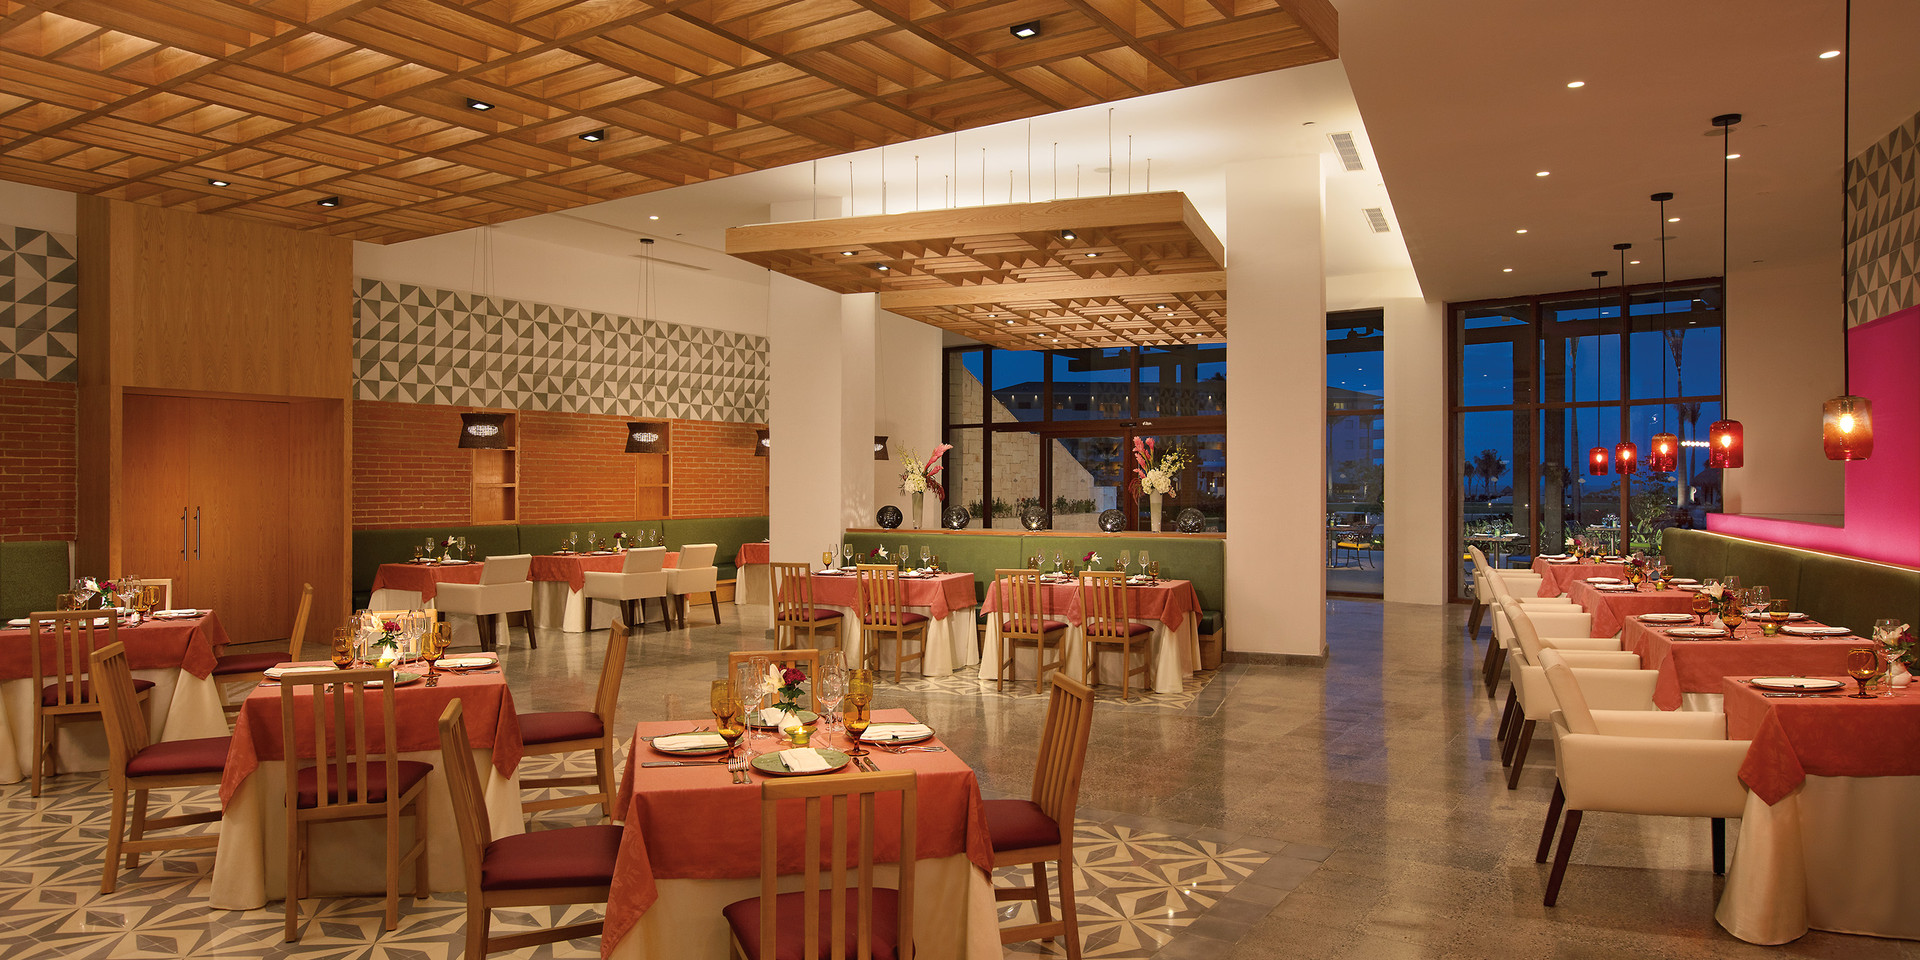 Tres Colores | Mexican Cuisine